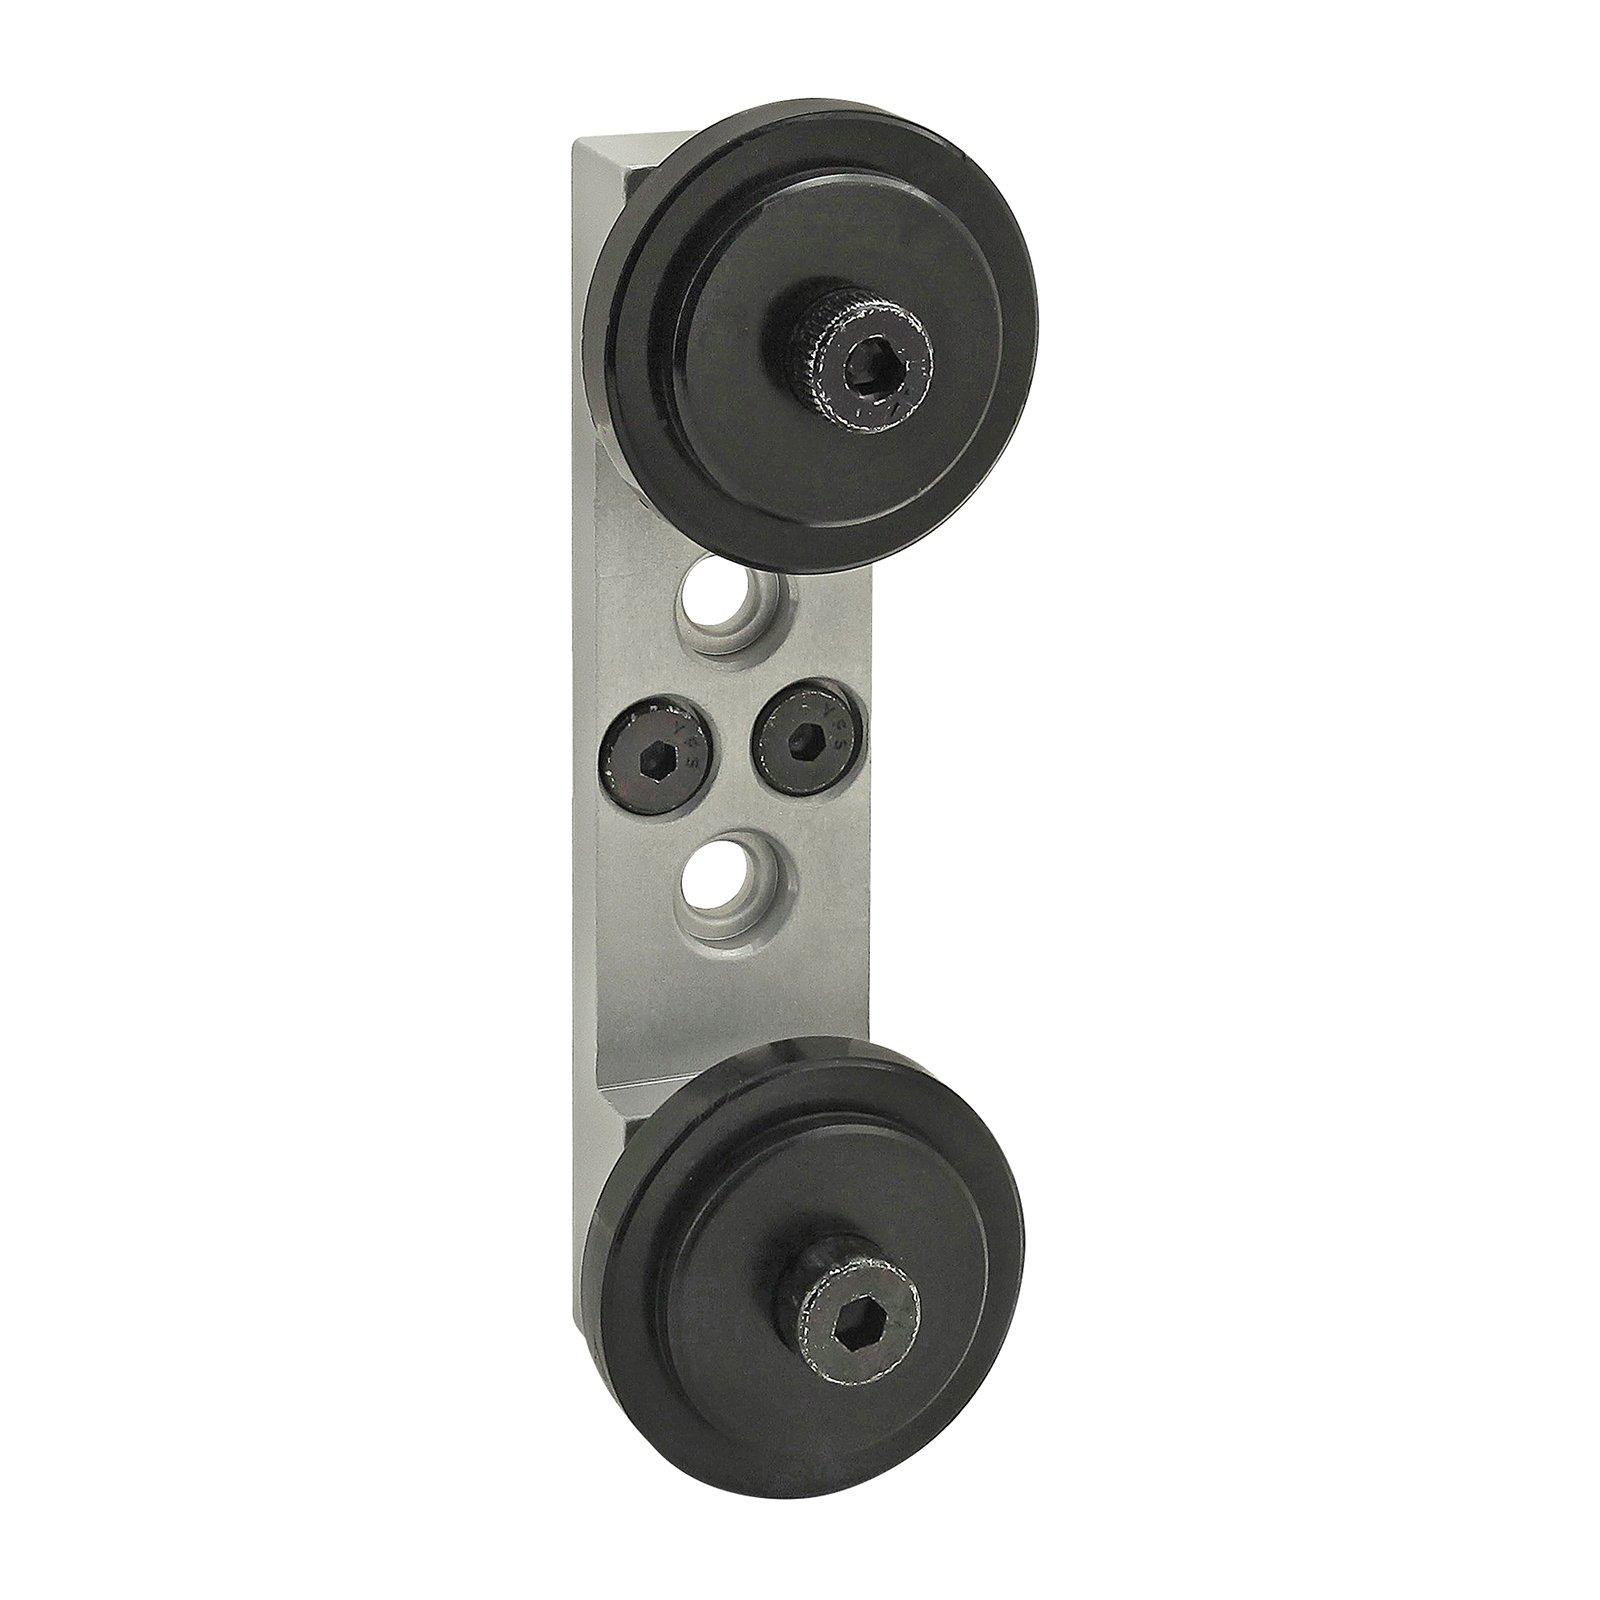 80/20 Inc., 2753, 10 Series, Roller Wheel Bracket Assembly